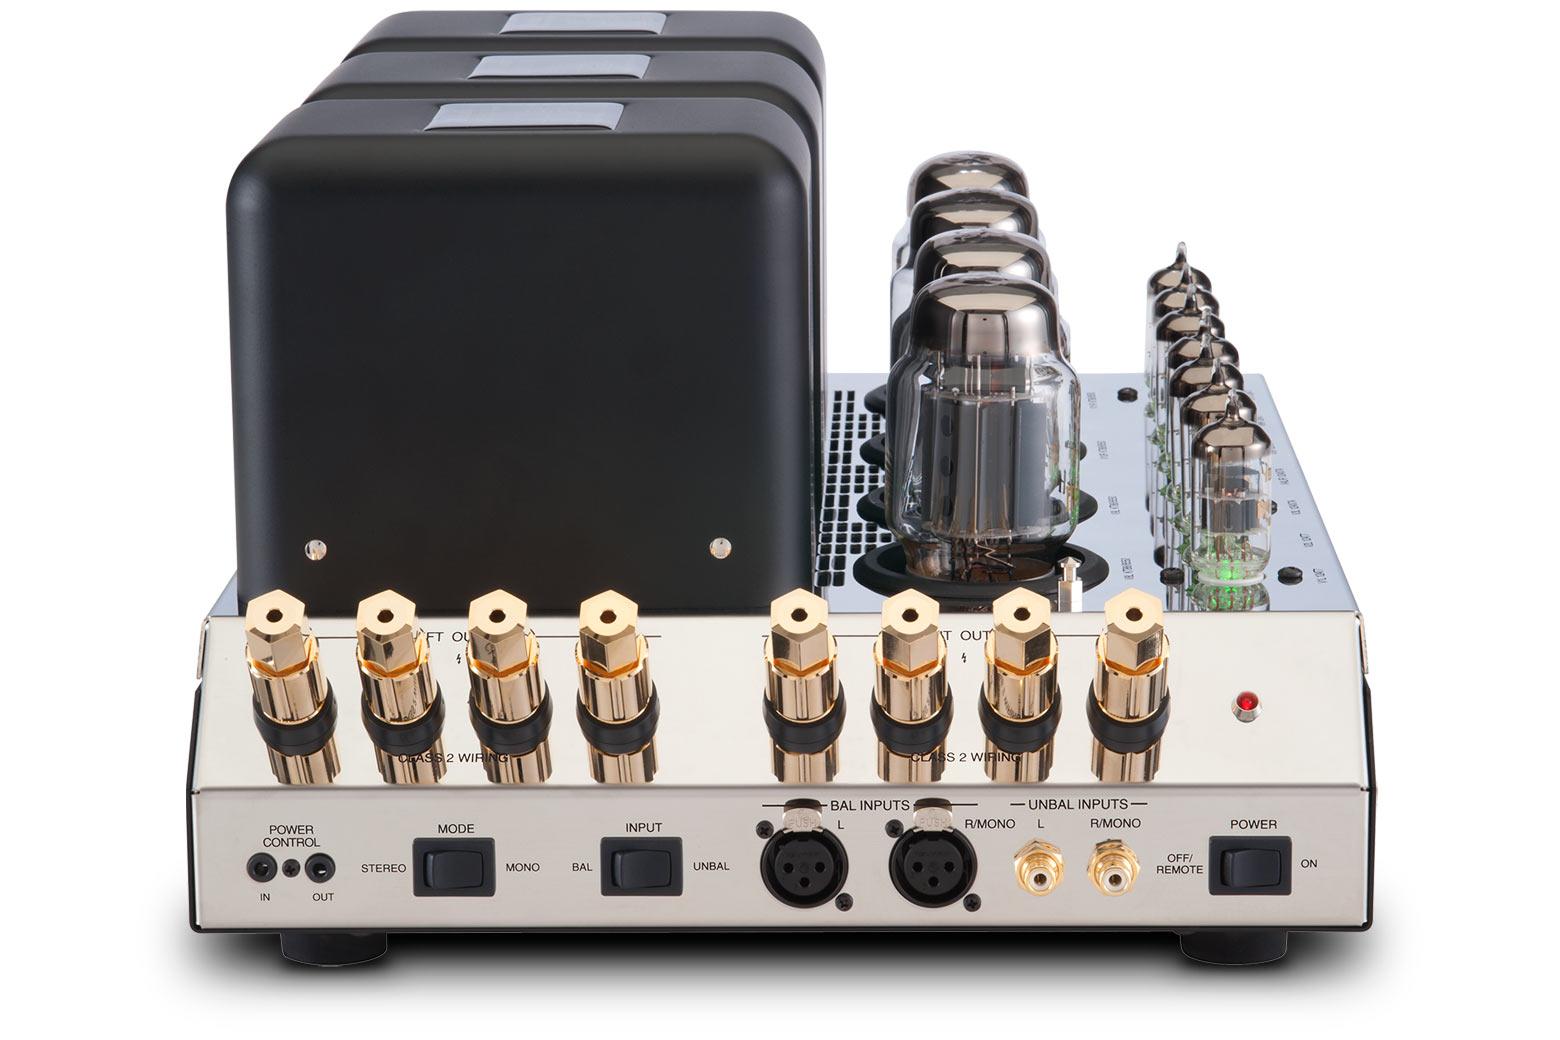 Mcintosh Mc275 Vacuum Tube Amplifier Mono Subwoofer Bass Speaker Amp W Cable Wiring Kit Ebay